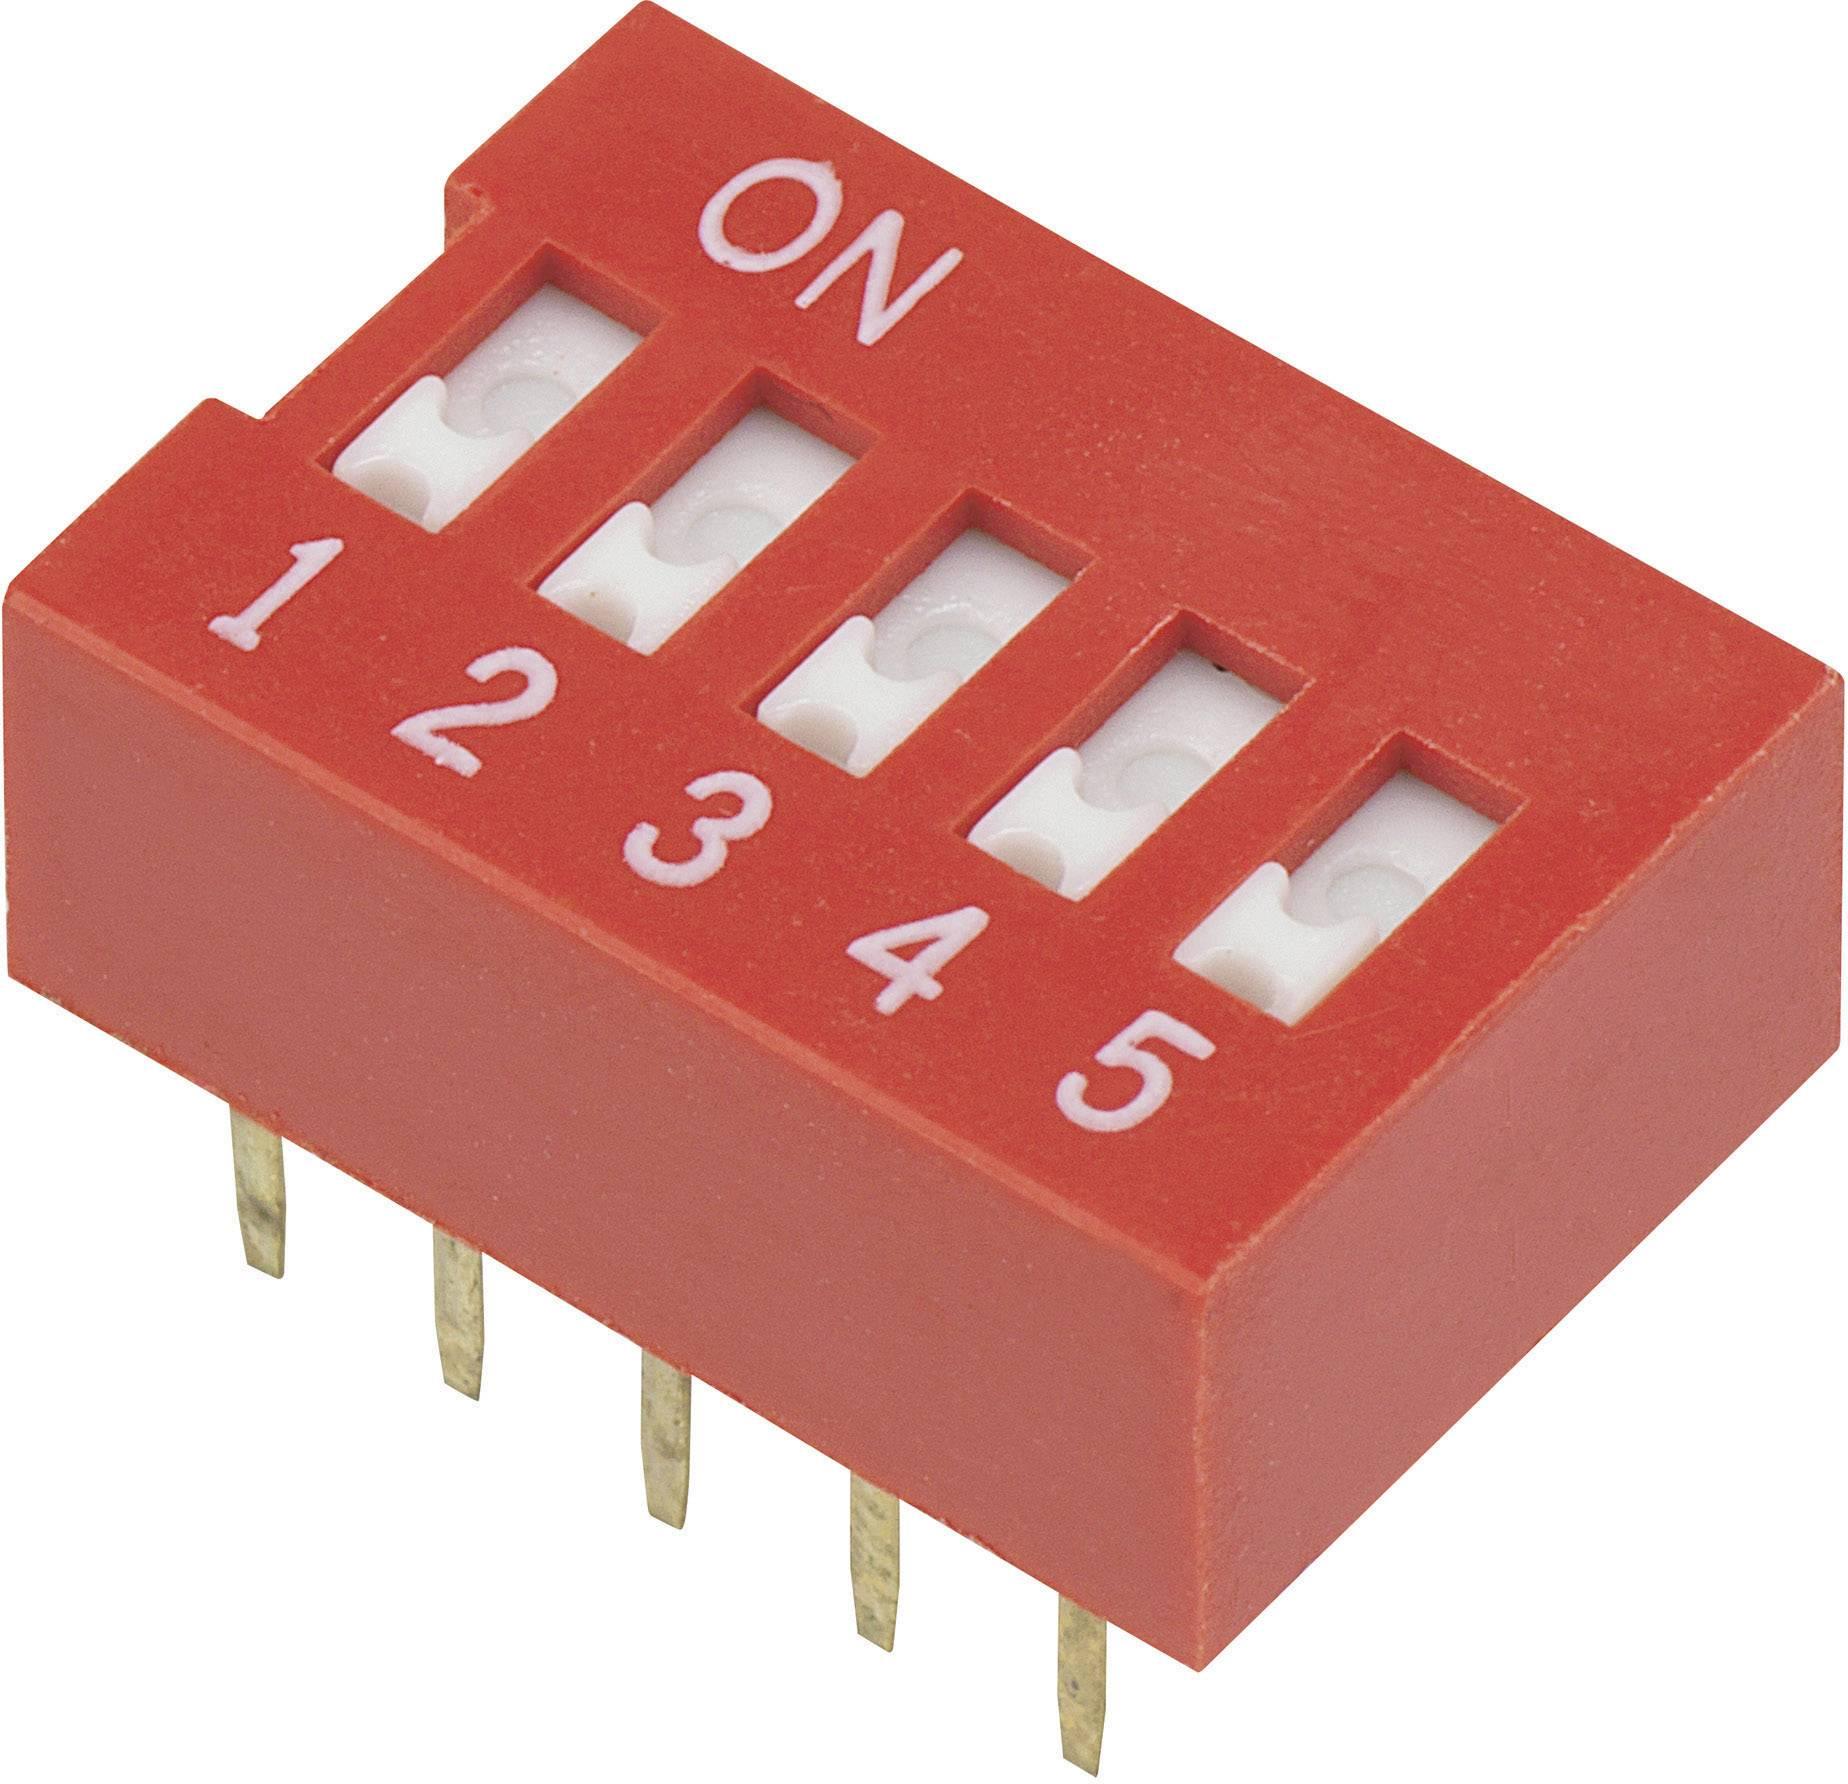 DIP spínač DSR-05, (š x v) 9,9 mm x 5,7 mm